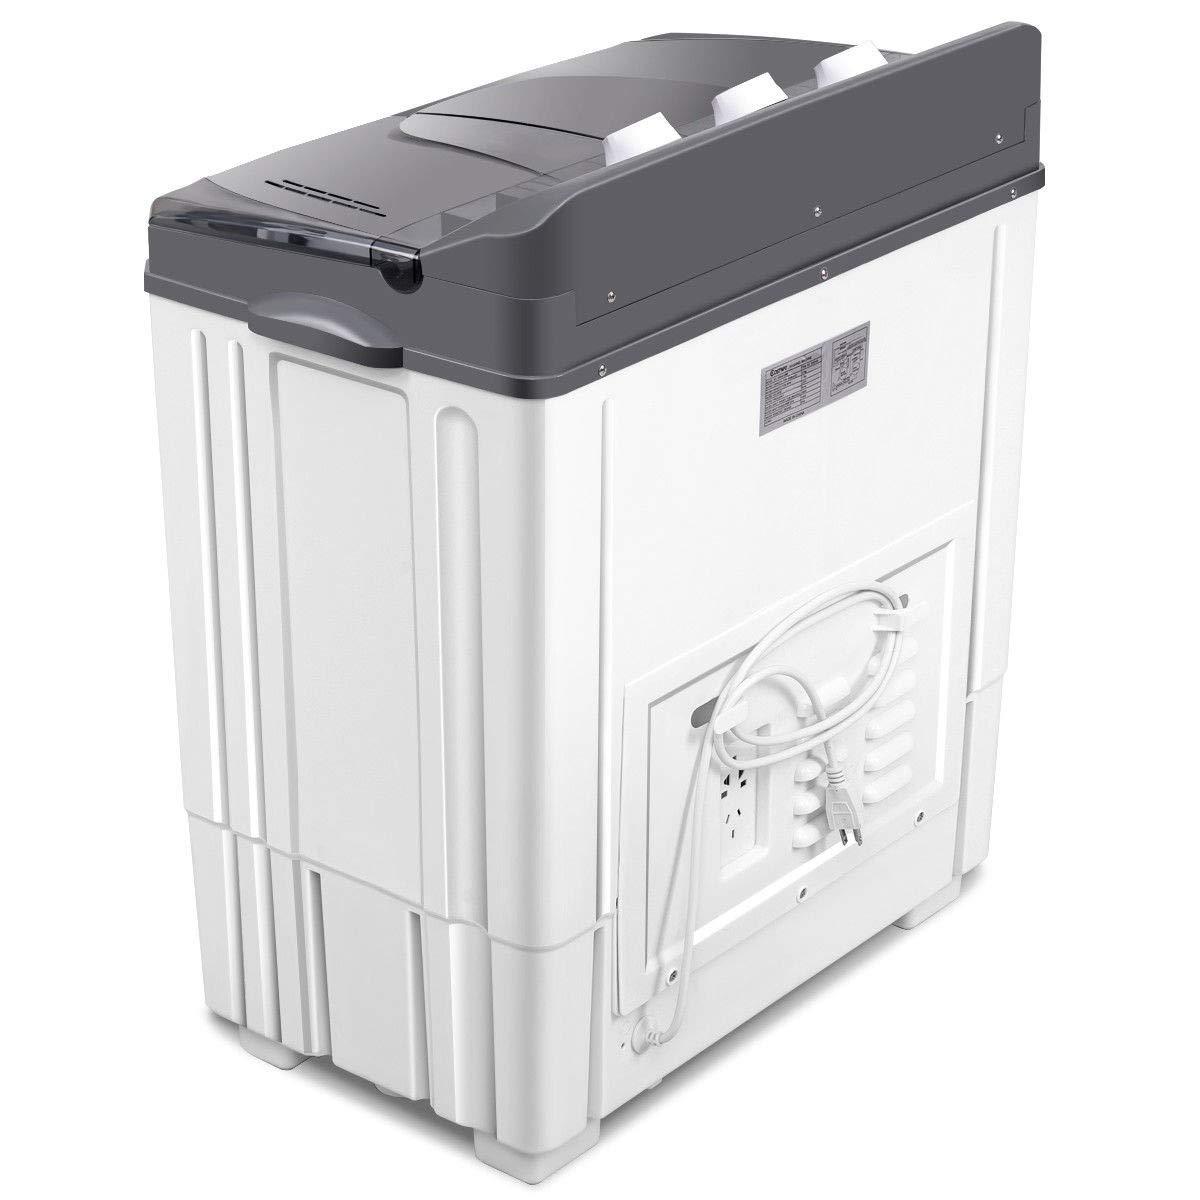 CHEAP LHONE Portable Twin Tub Washing Machine with Spin ...